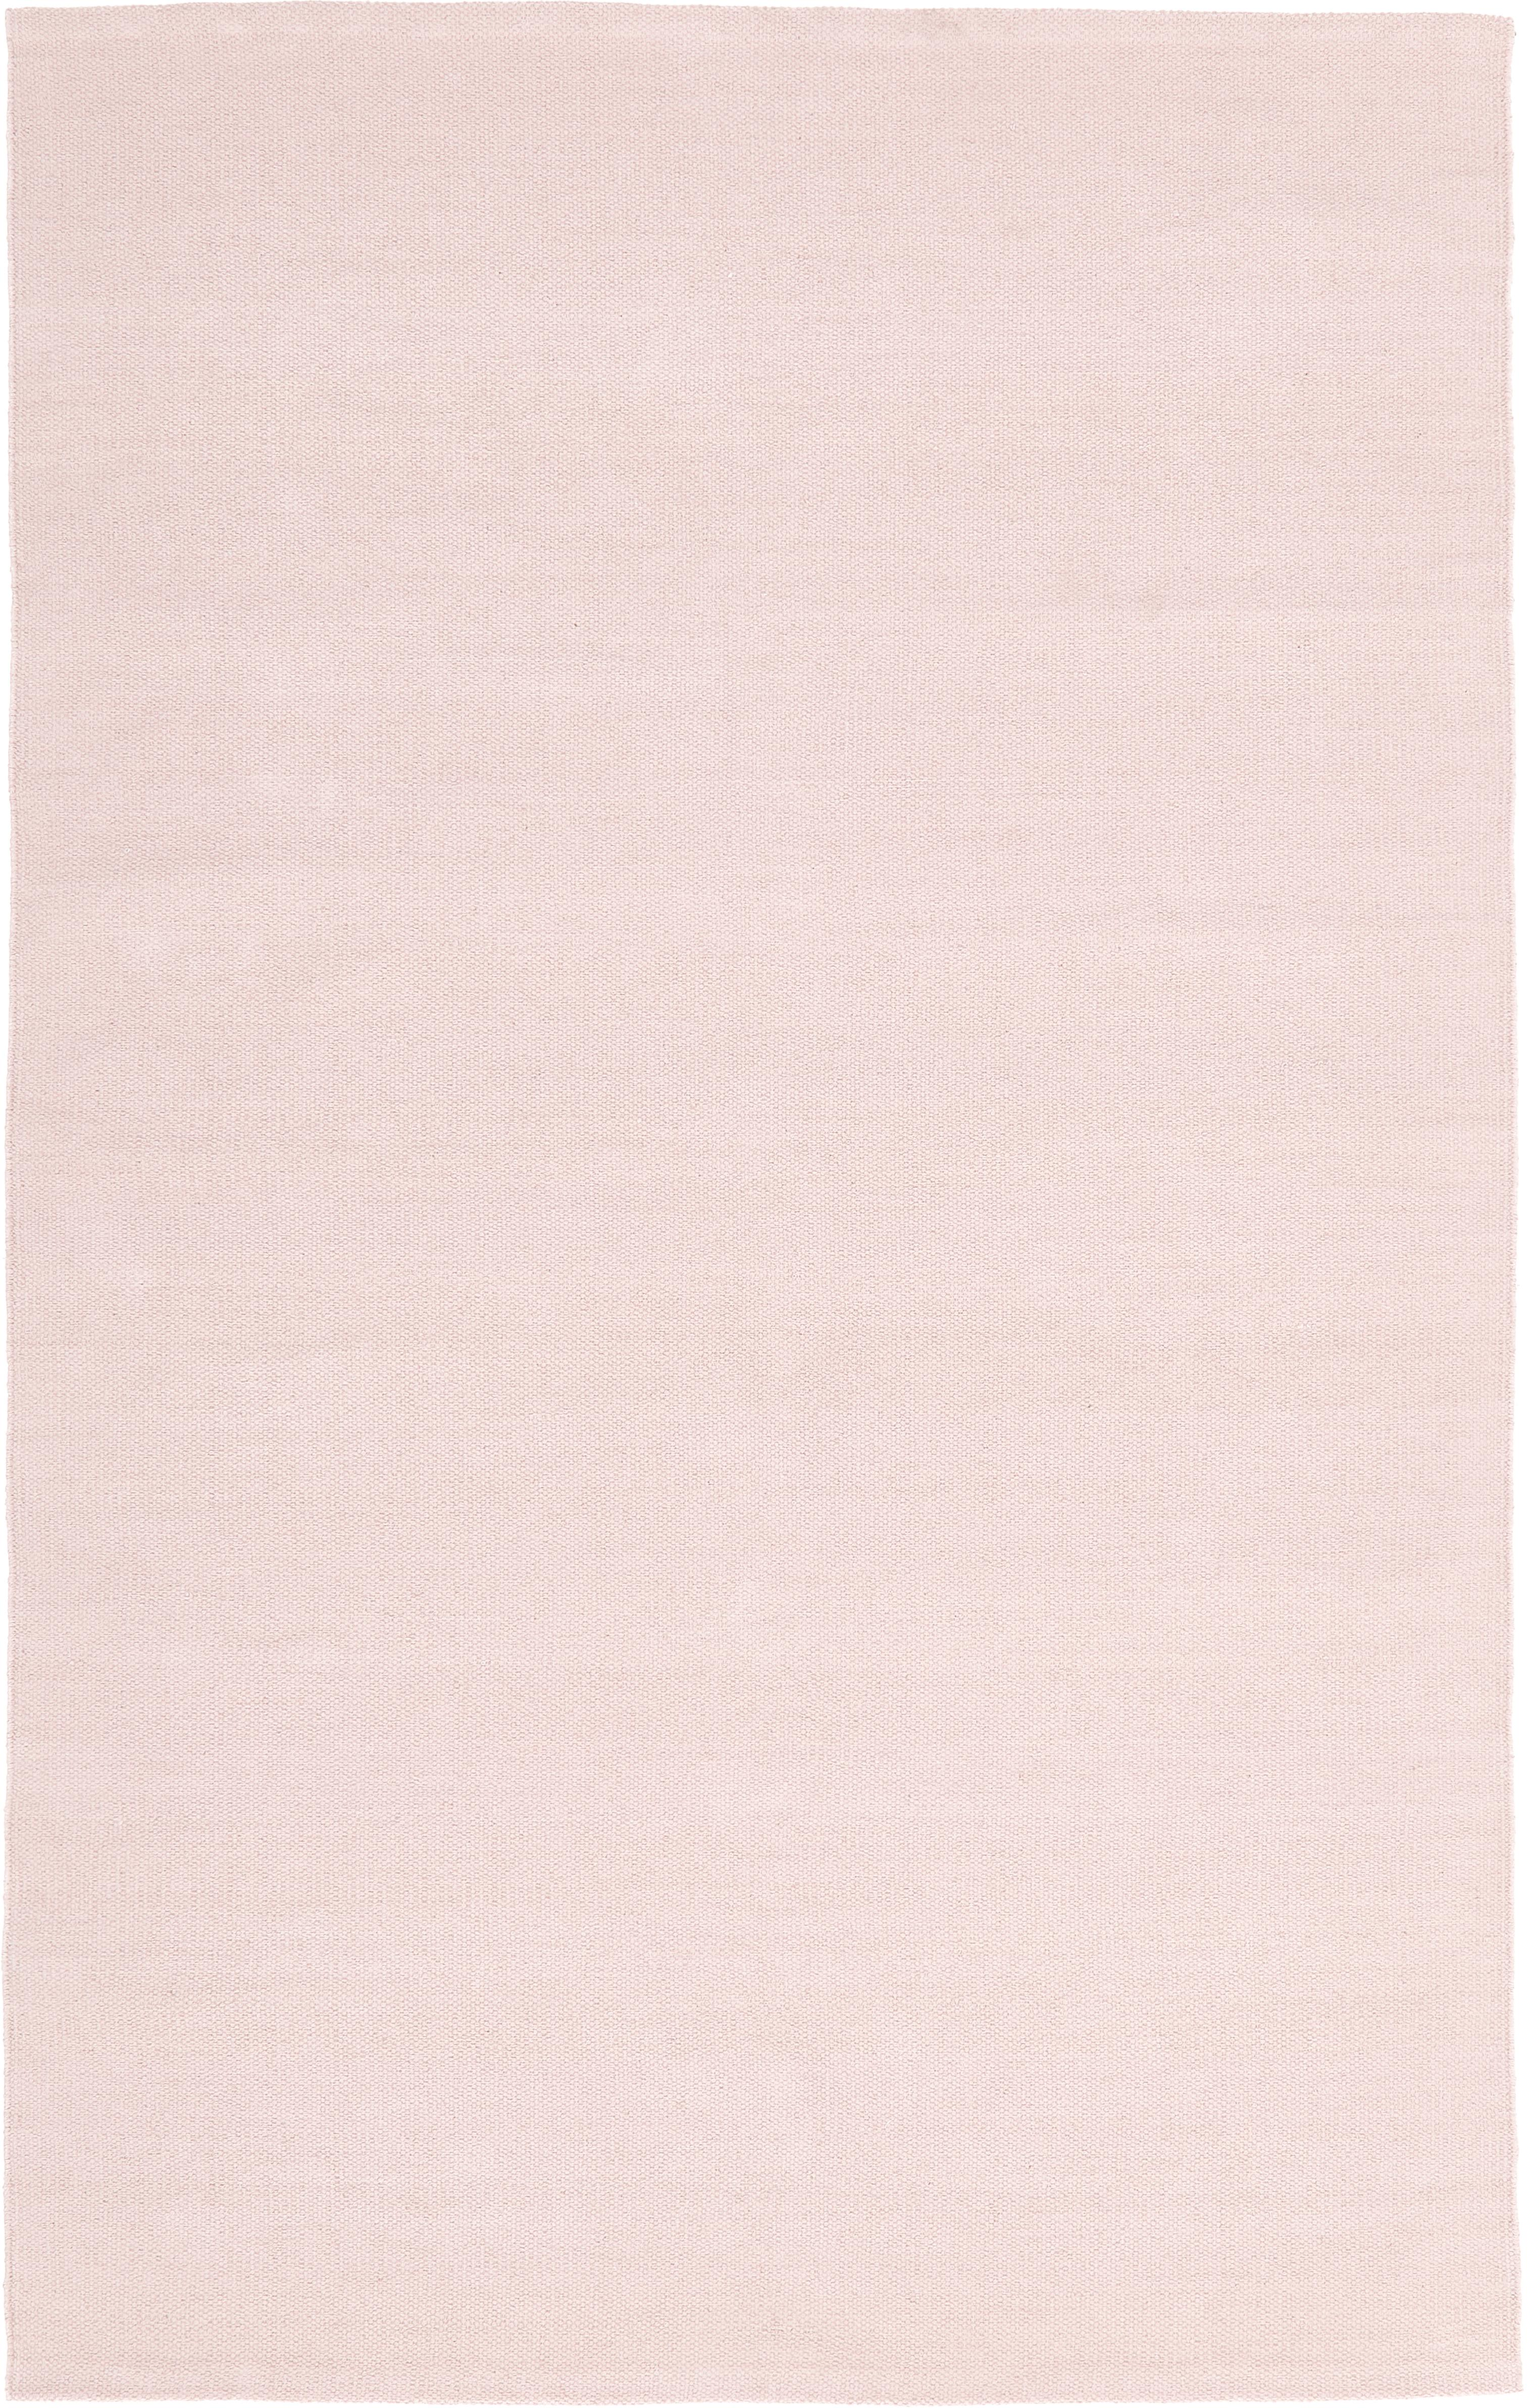 Dünner Baumwollteppich Agneta, handgewebt, 100% Baumwolle, Rosa, B 50 x L 80 cm (Grösse XXS)